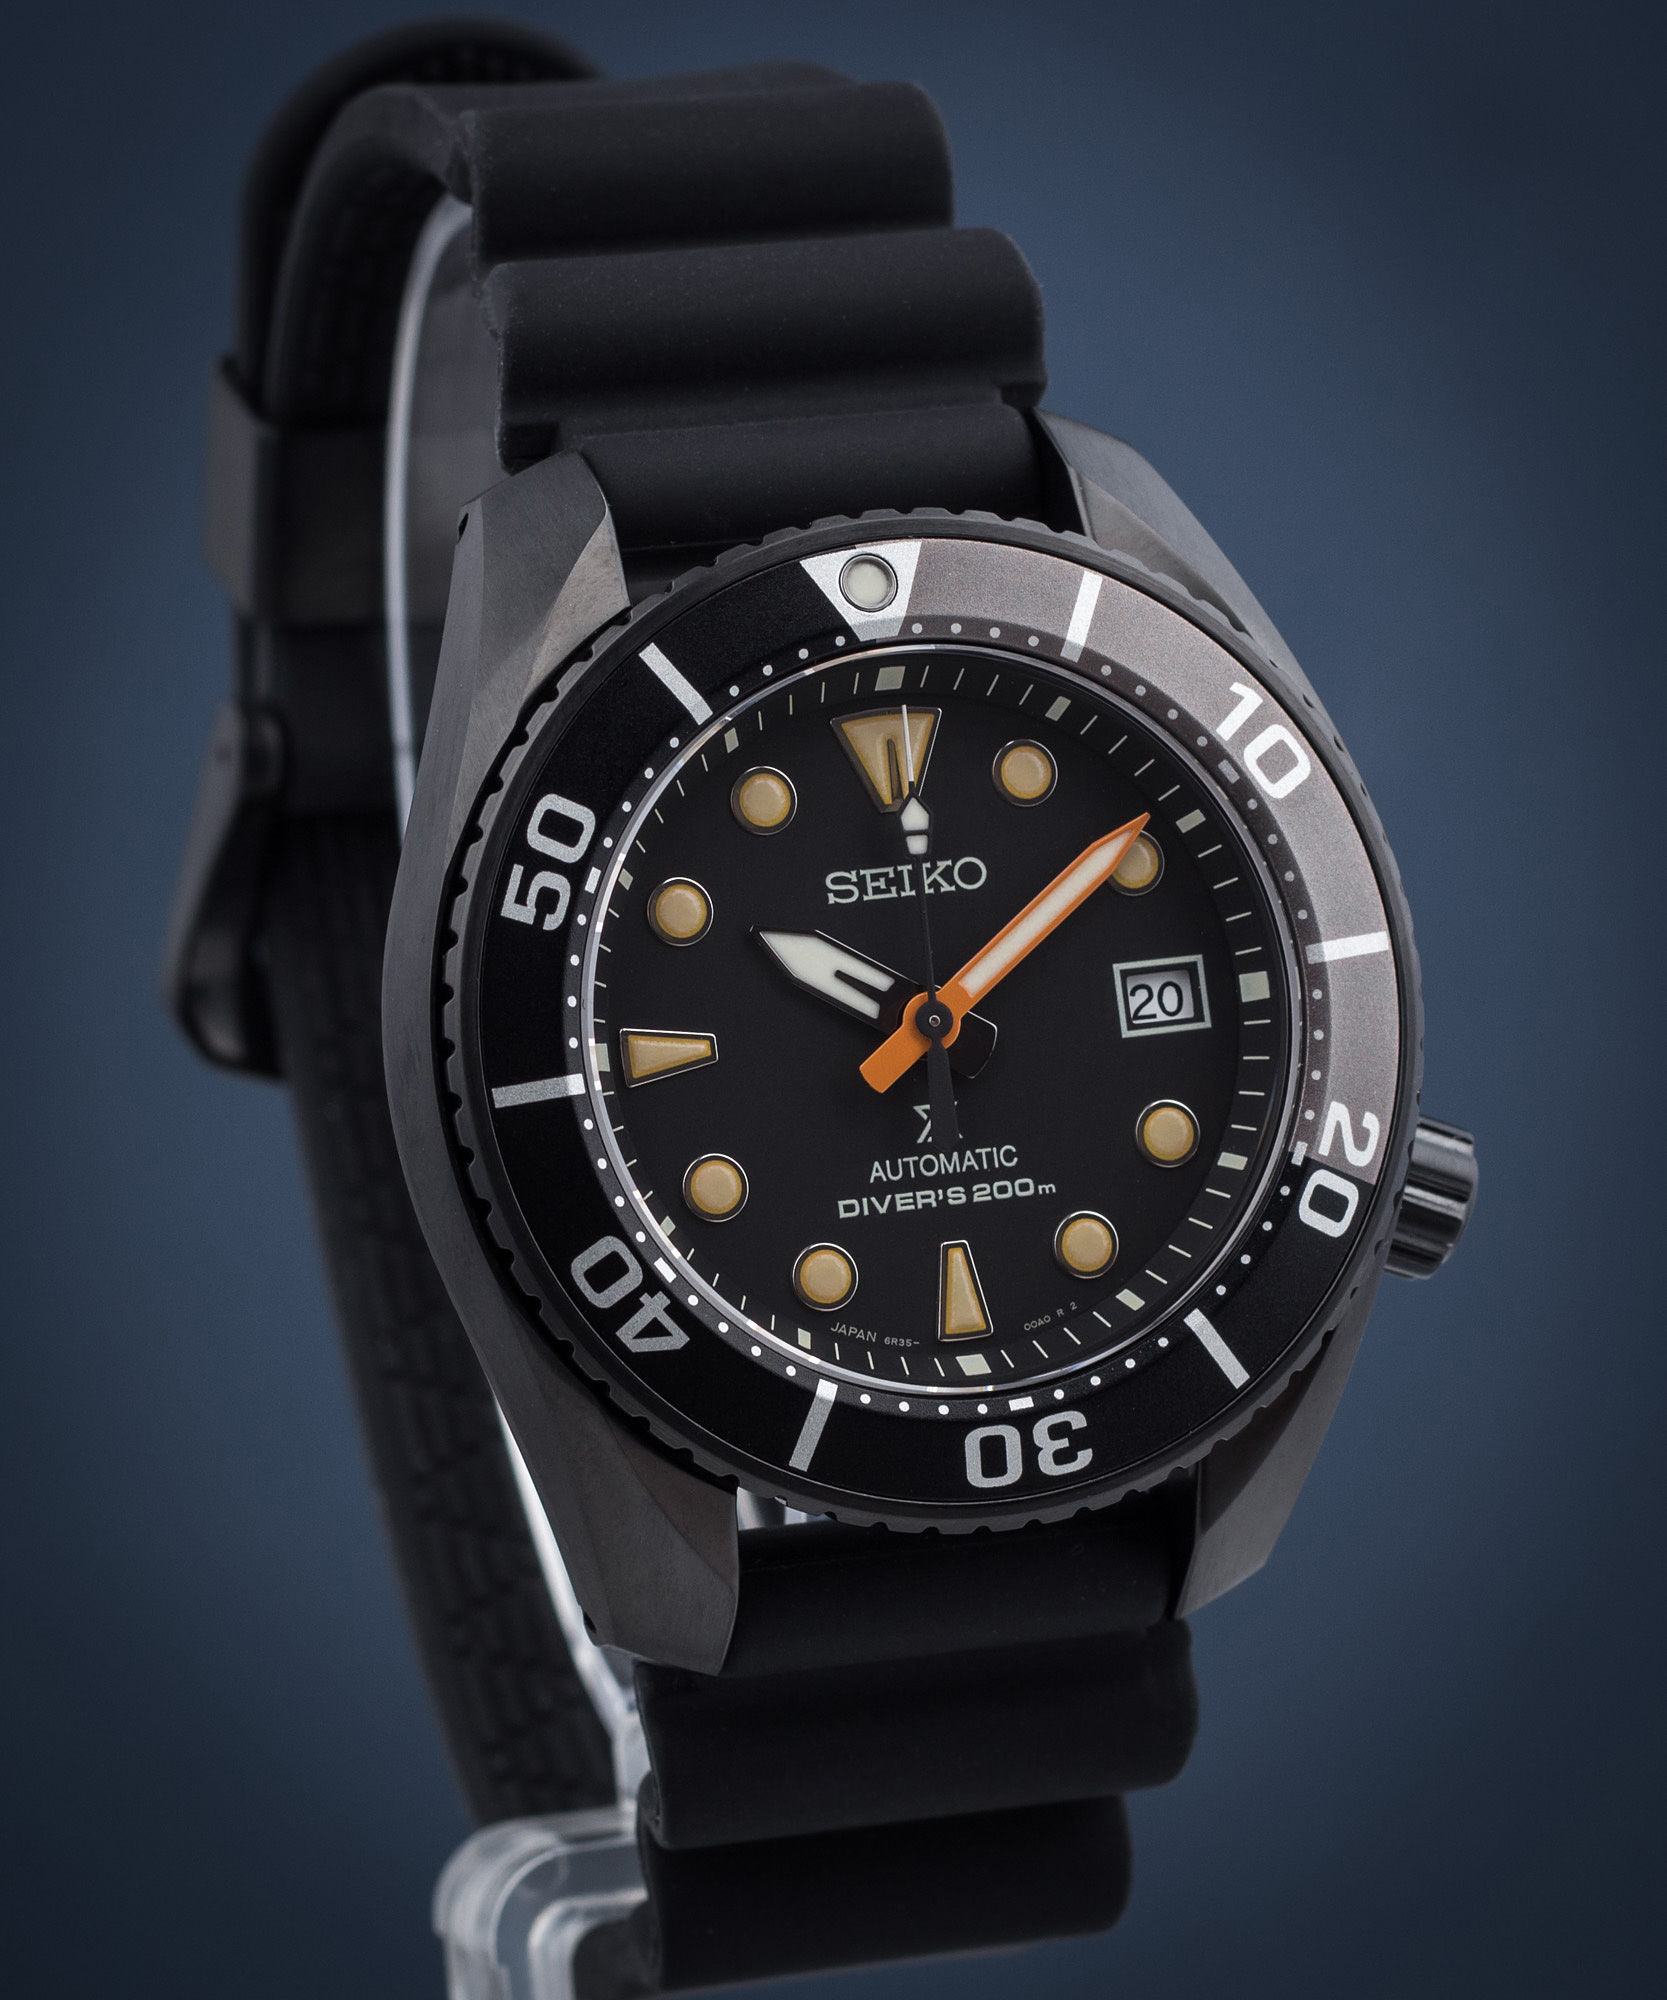 Zegarek męski Seiko Prospex The Black Series Sumo Diver Automatic Limited Edition